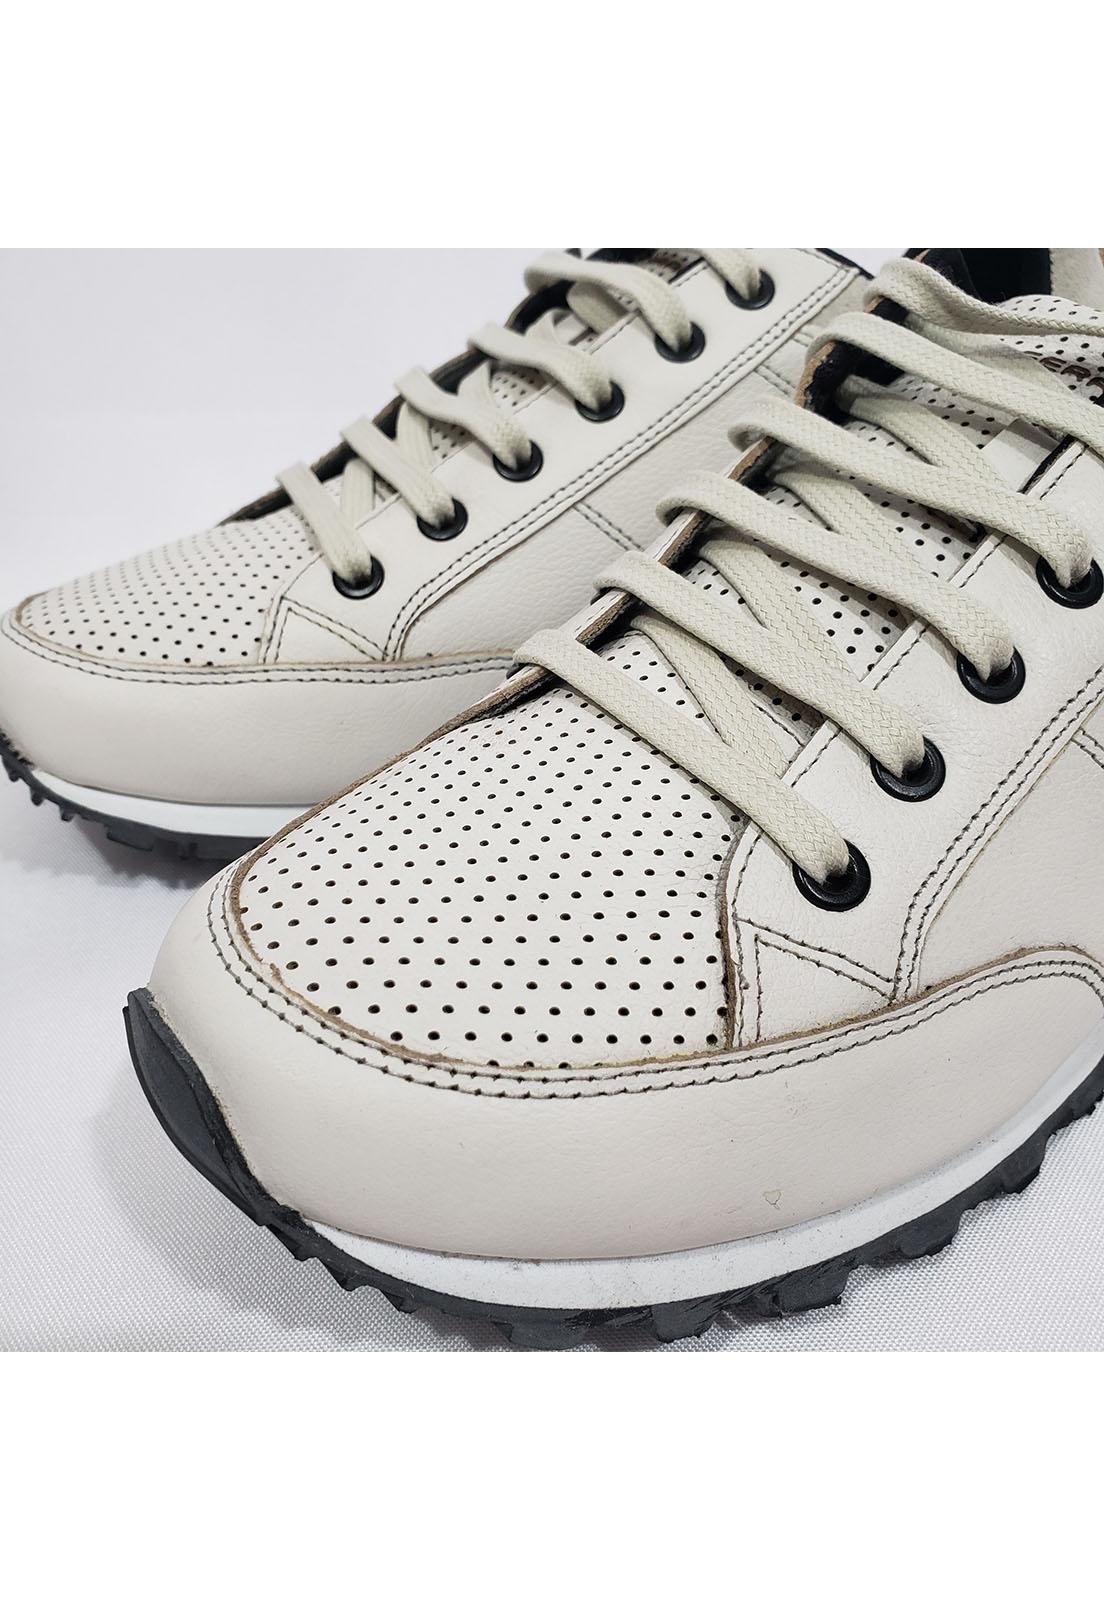 Tenis Ferracini OFF WHITE Bold-7517-290A